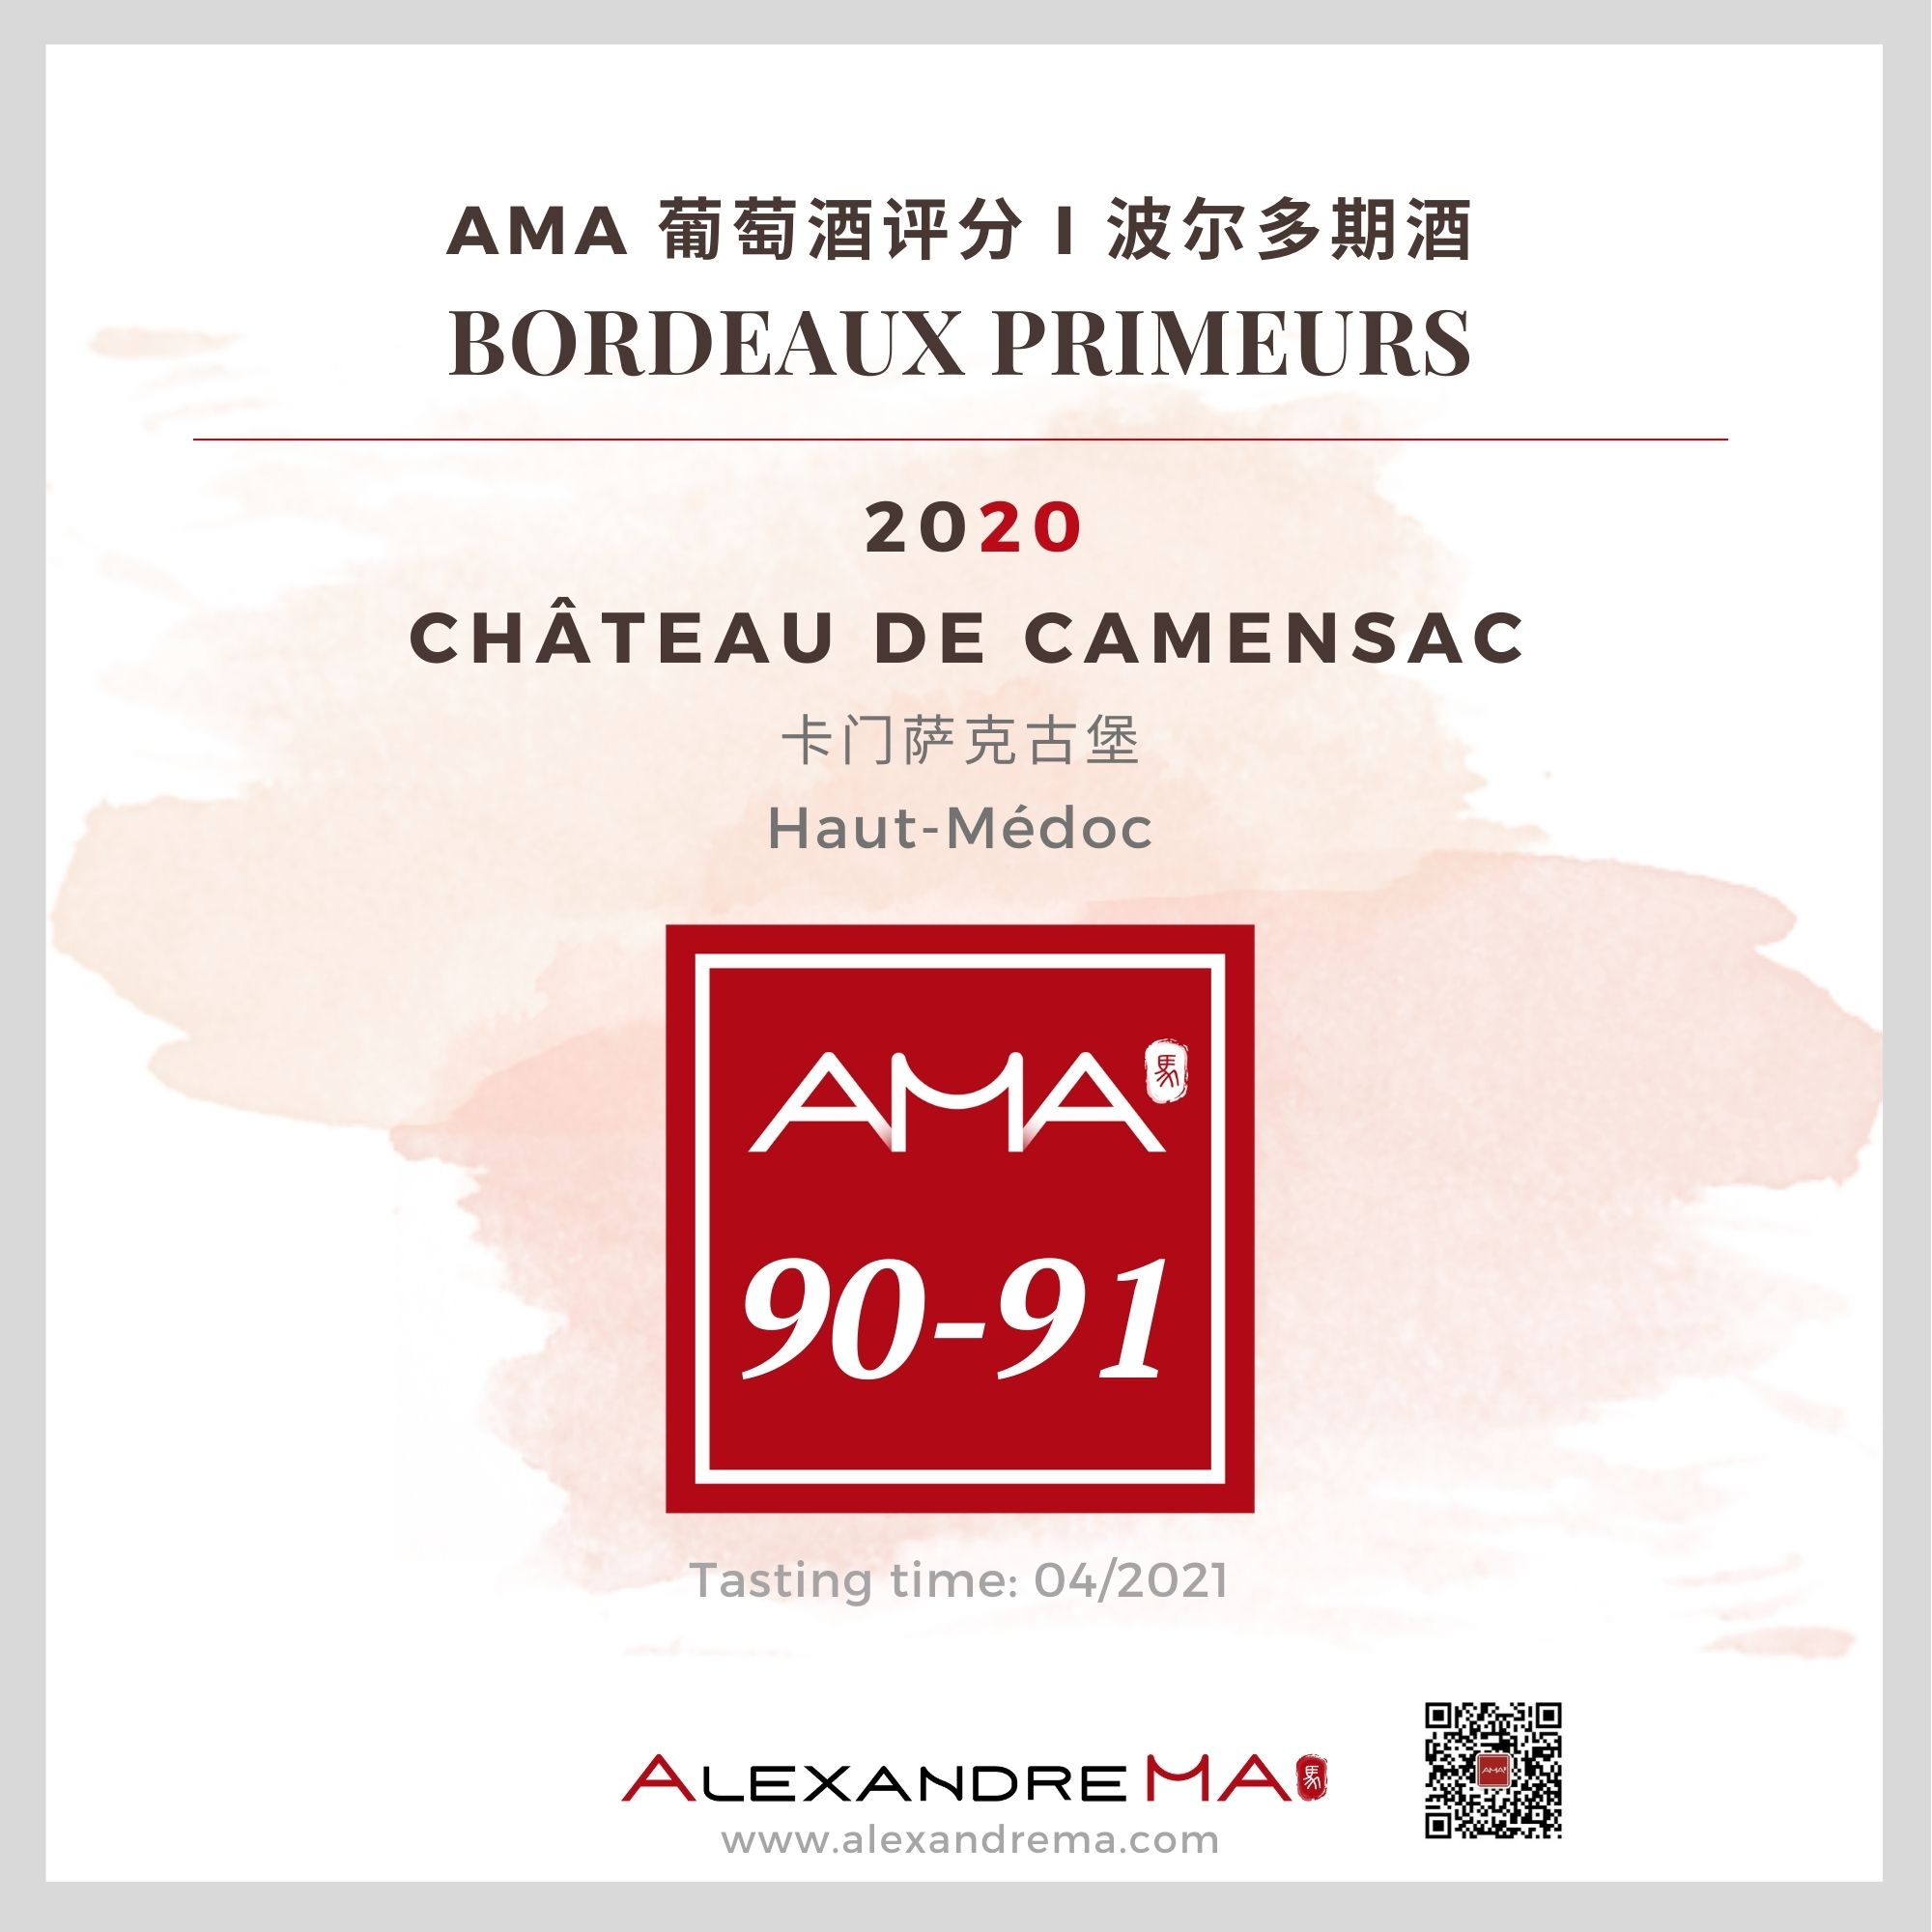 Château de Camensac 2020 卡门萨克古堡 - Alexandre Ma